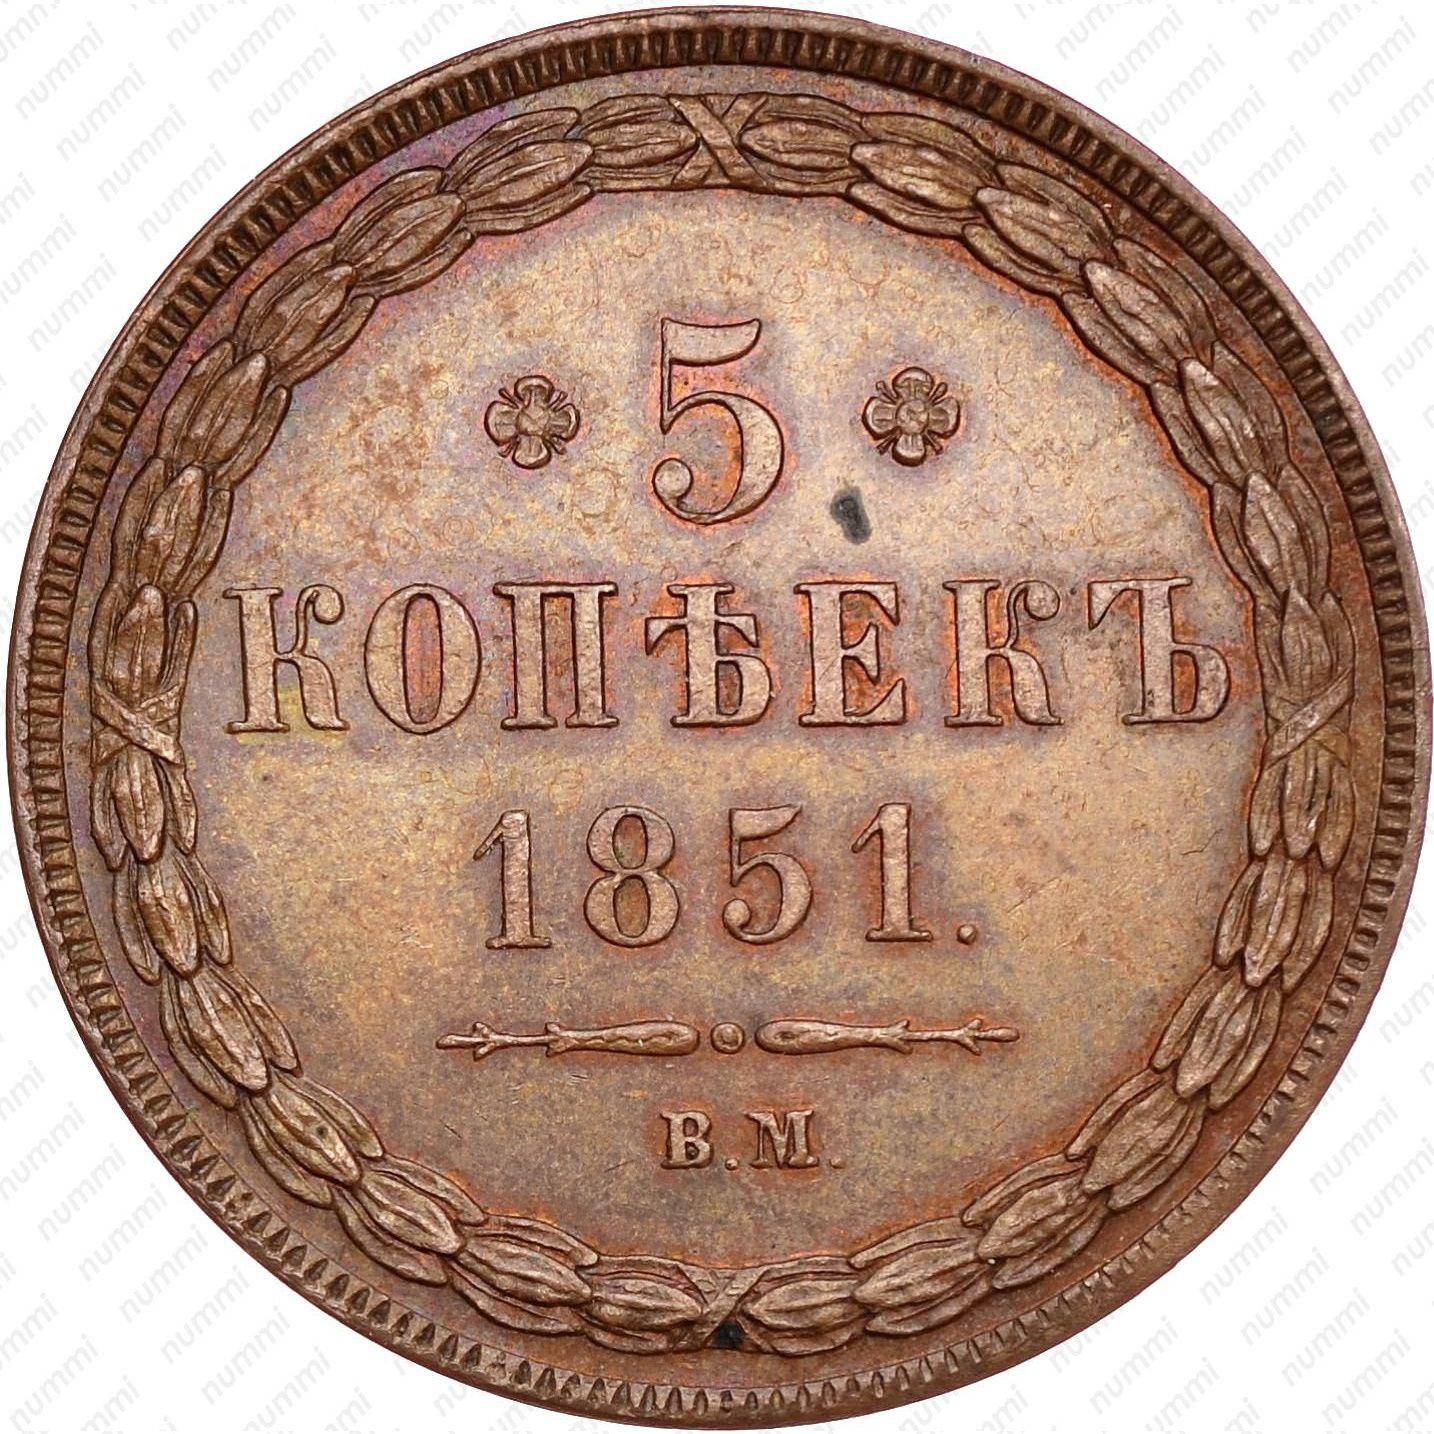 5 копеек 1851, ВМ - Реверс ...